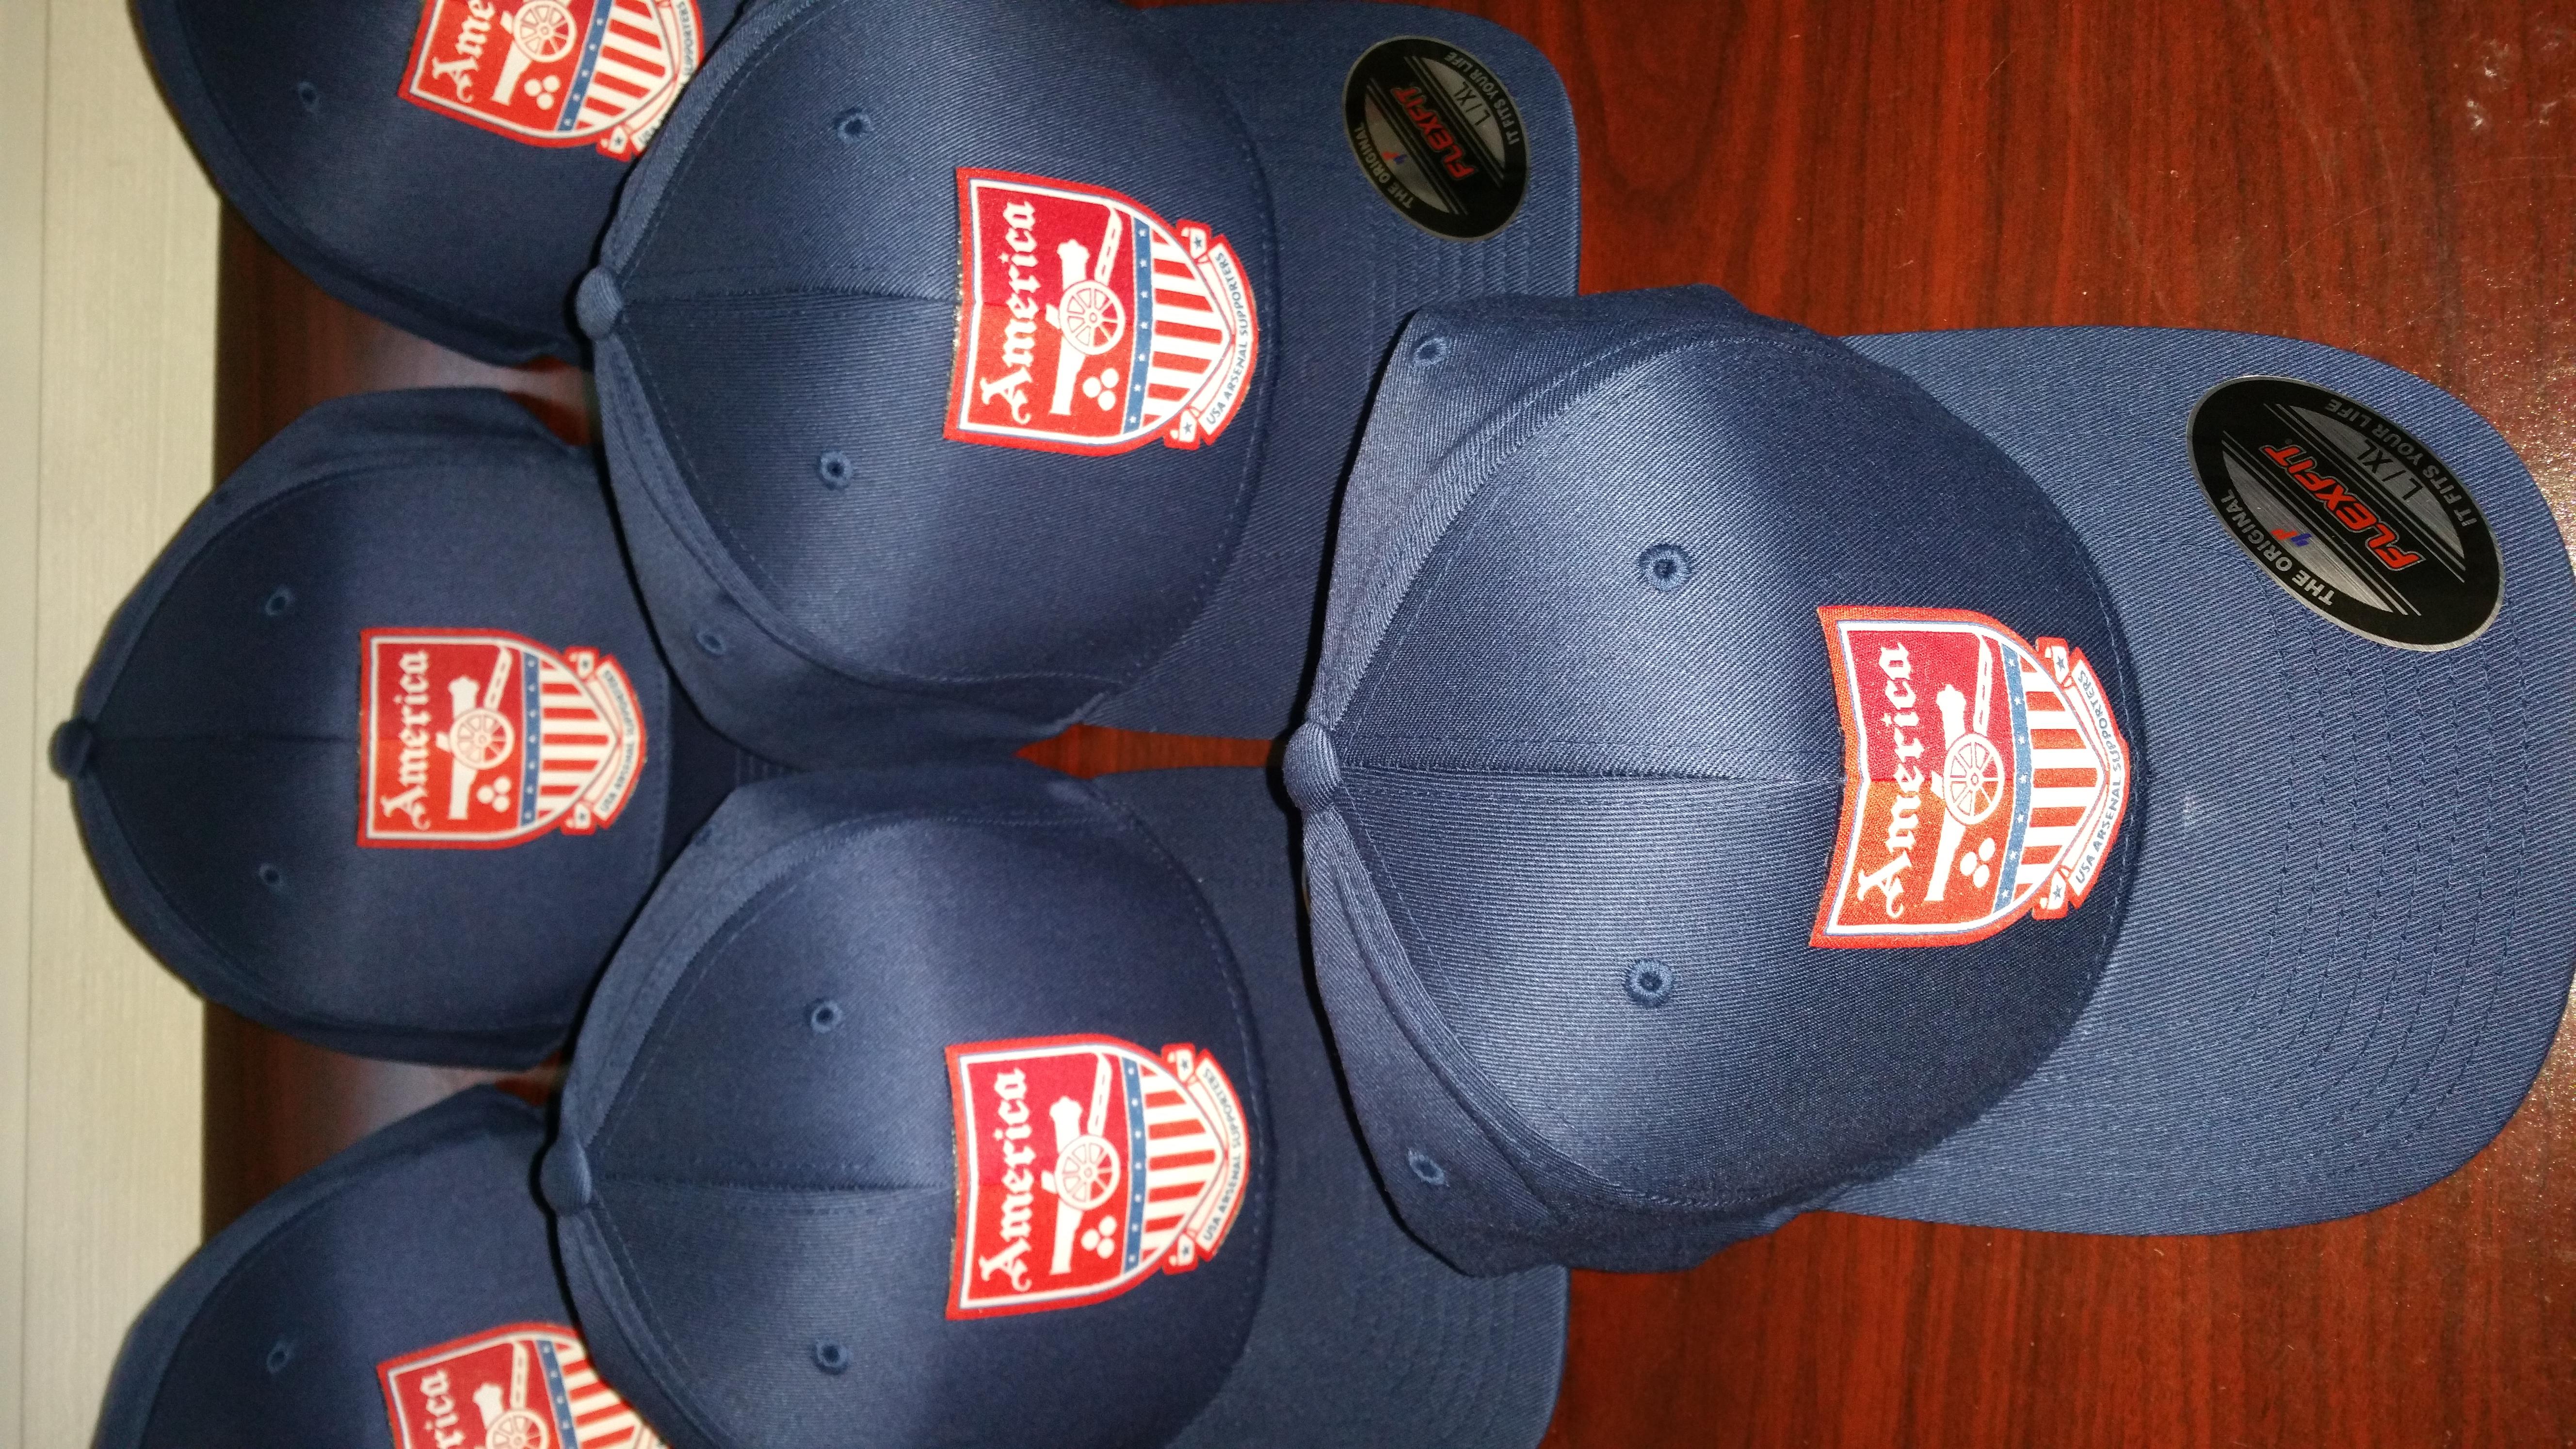 MEMBERSHIP PATCH HATS